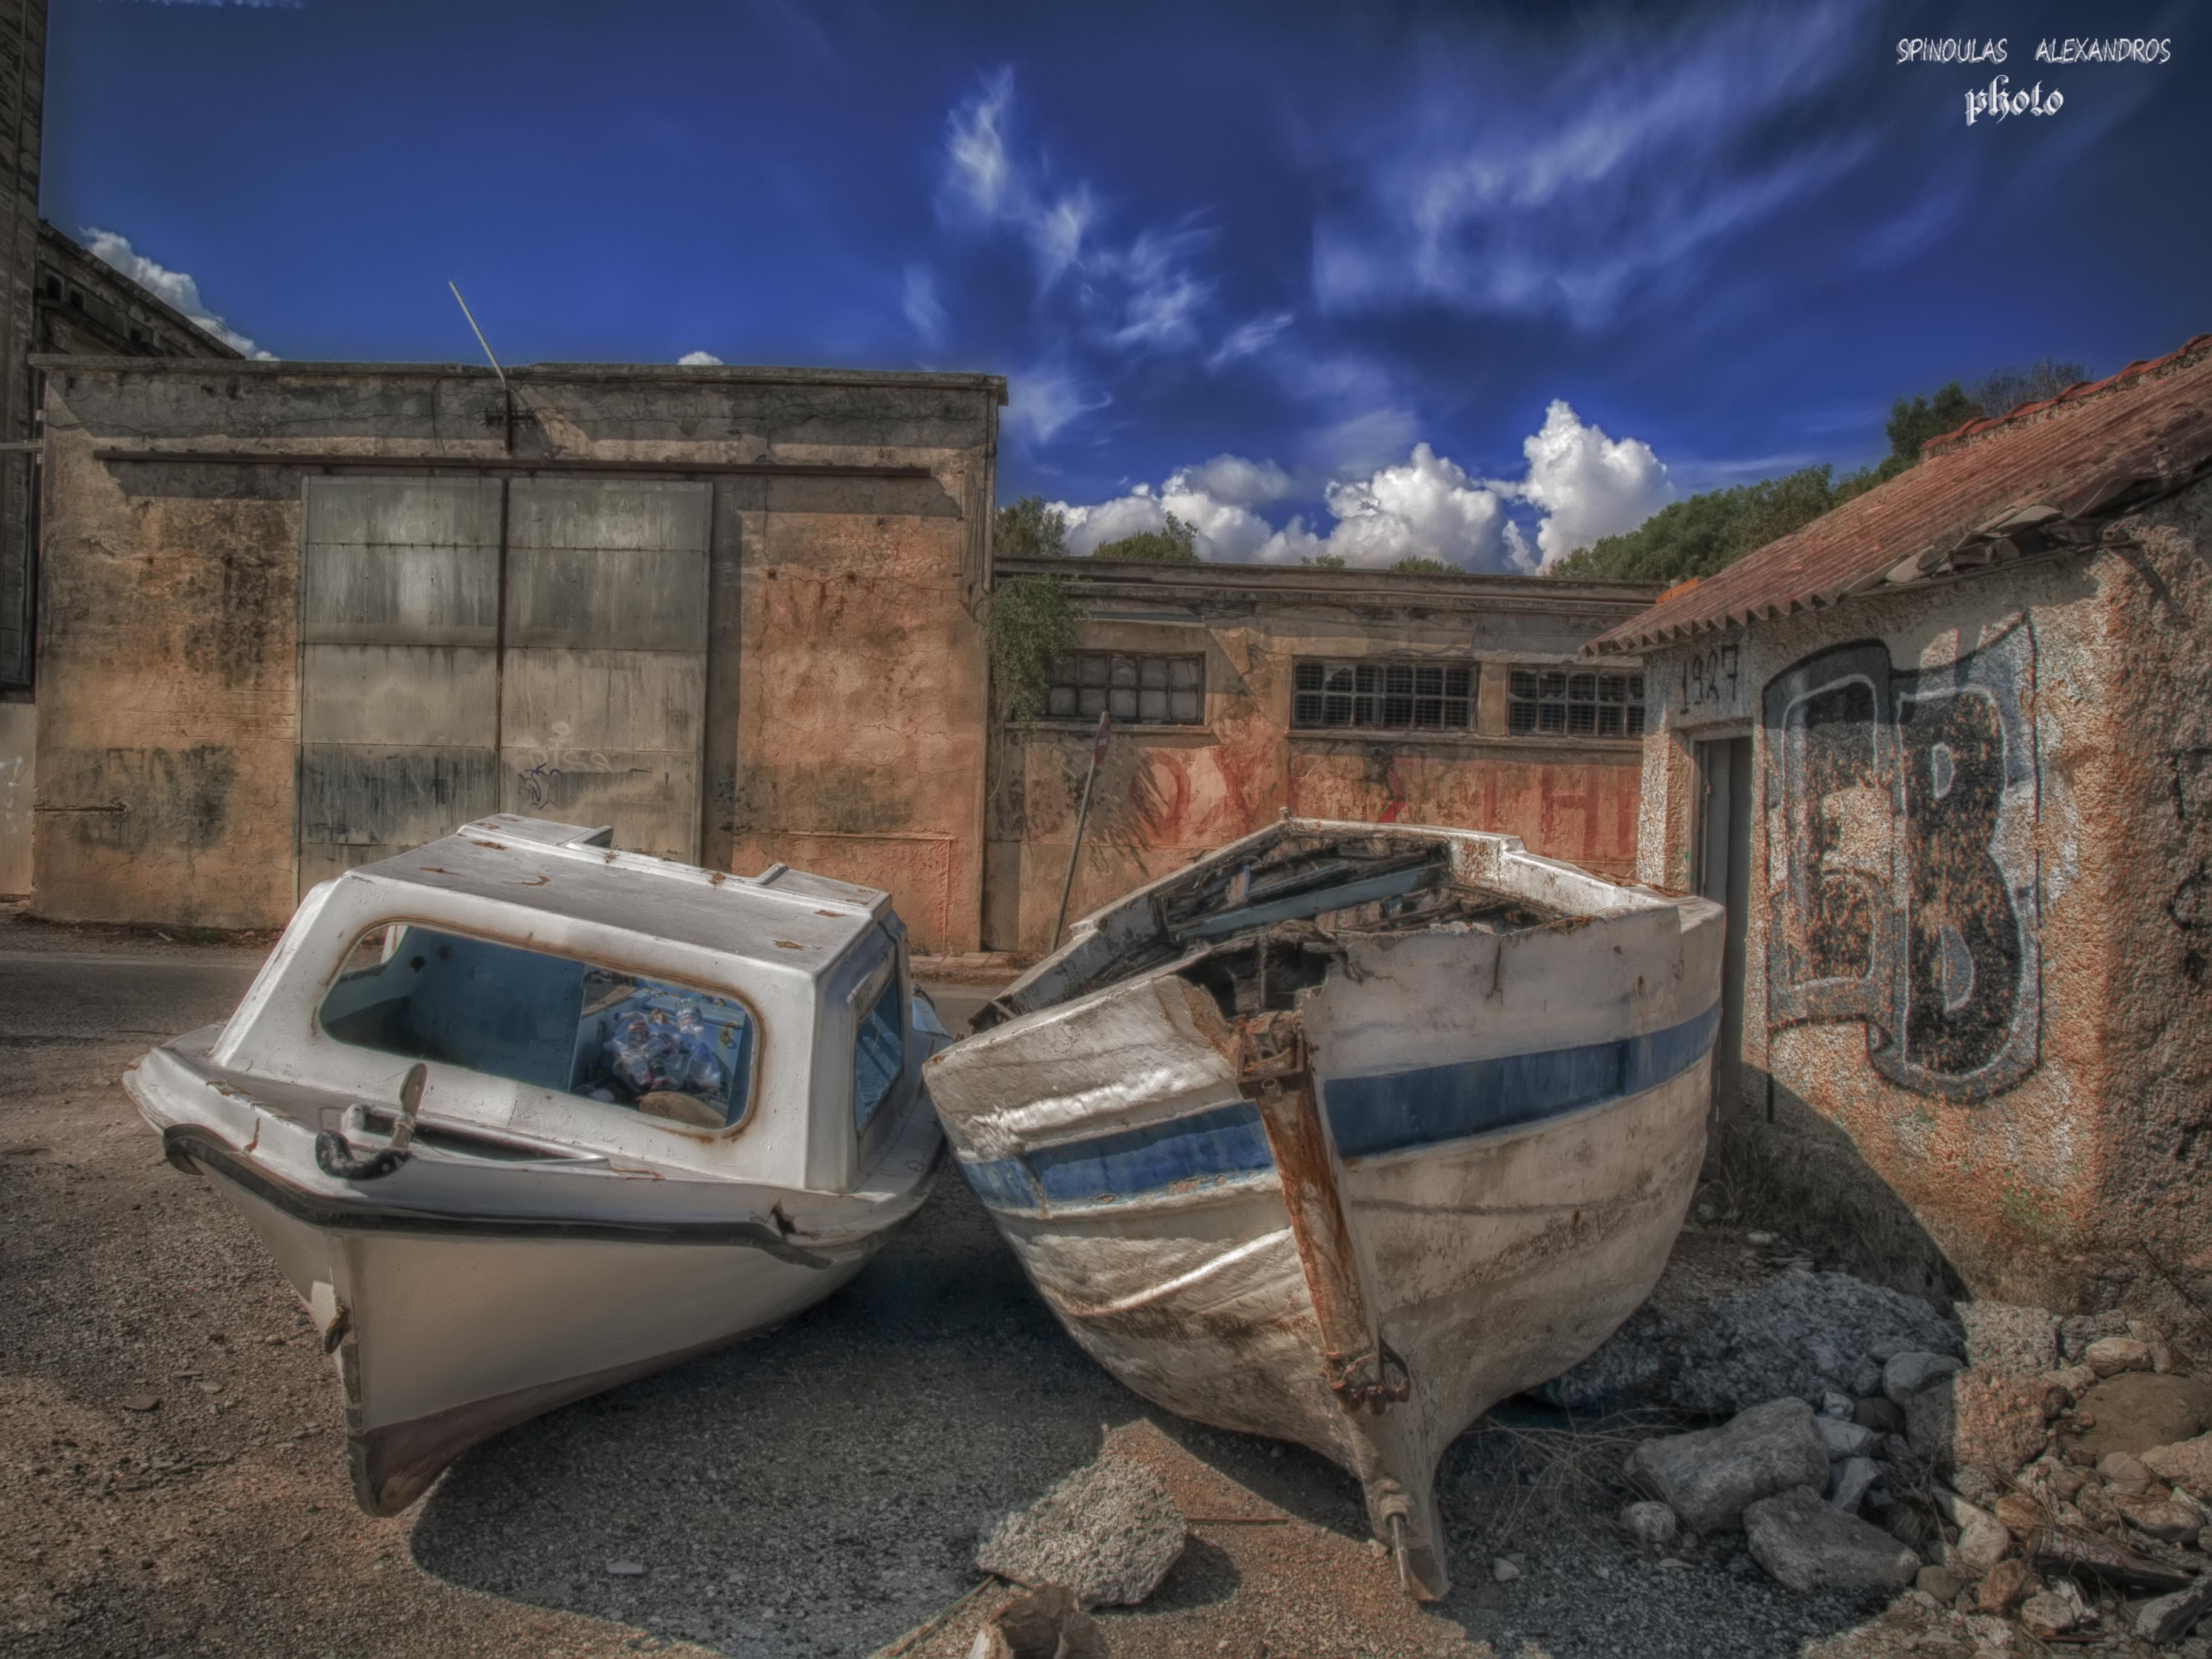 Hintergrundbilder : alt, Himmel, verlassen, Gebäude, Boot, Farben ...